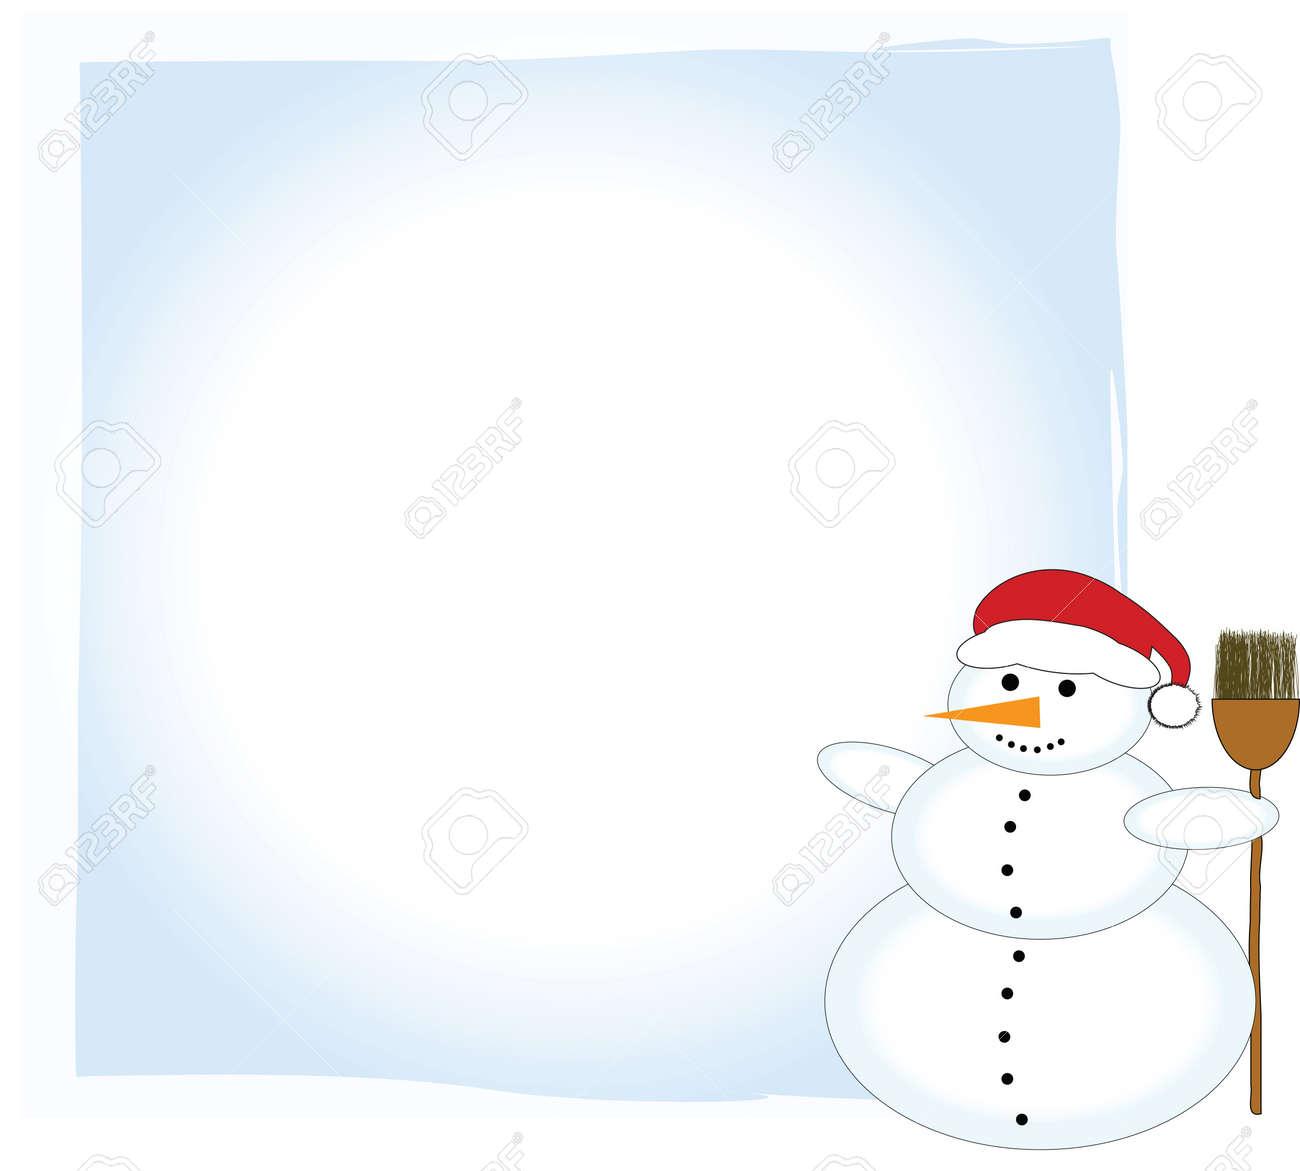 christmas illustration Stock Vector - 12848205